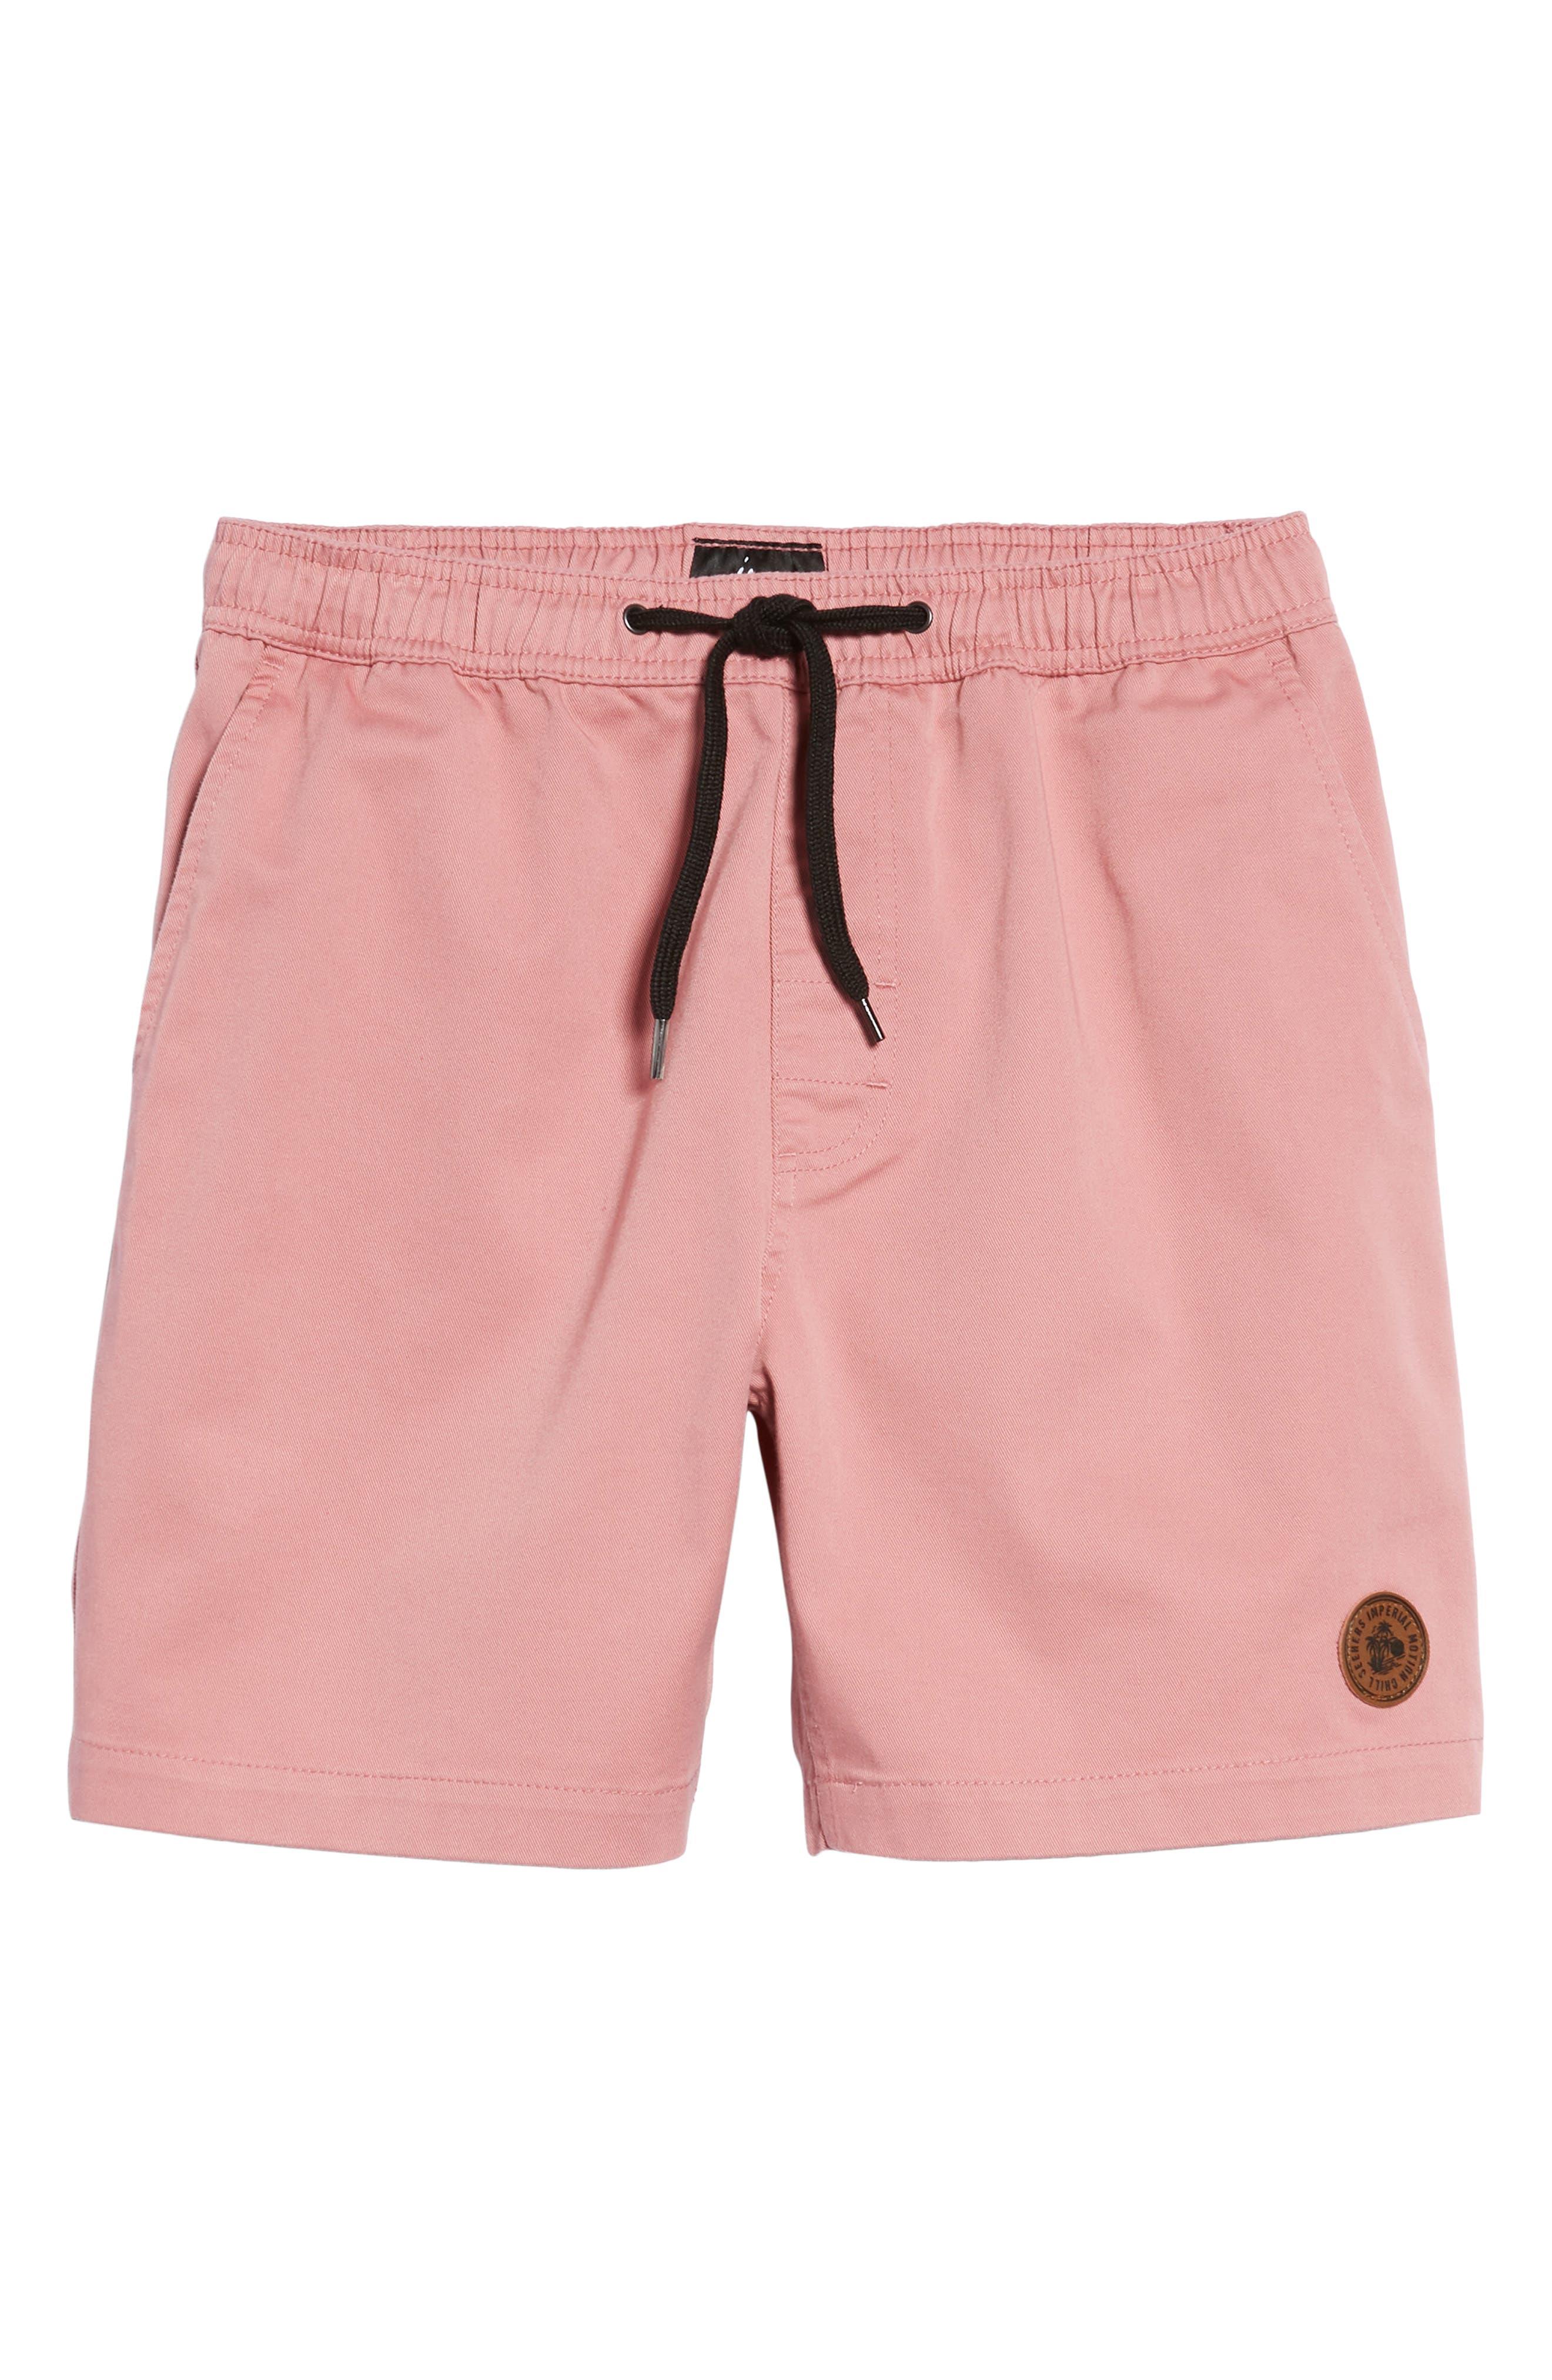 Seeker Shorts,                             Alternate thumbnail 6, color,                             Light Pink